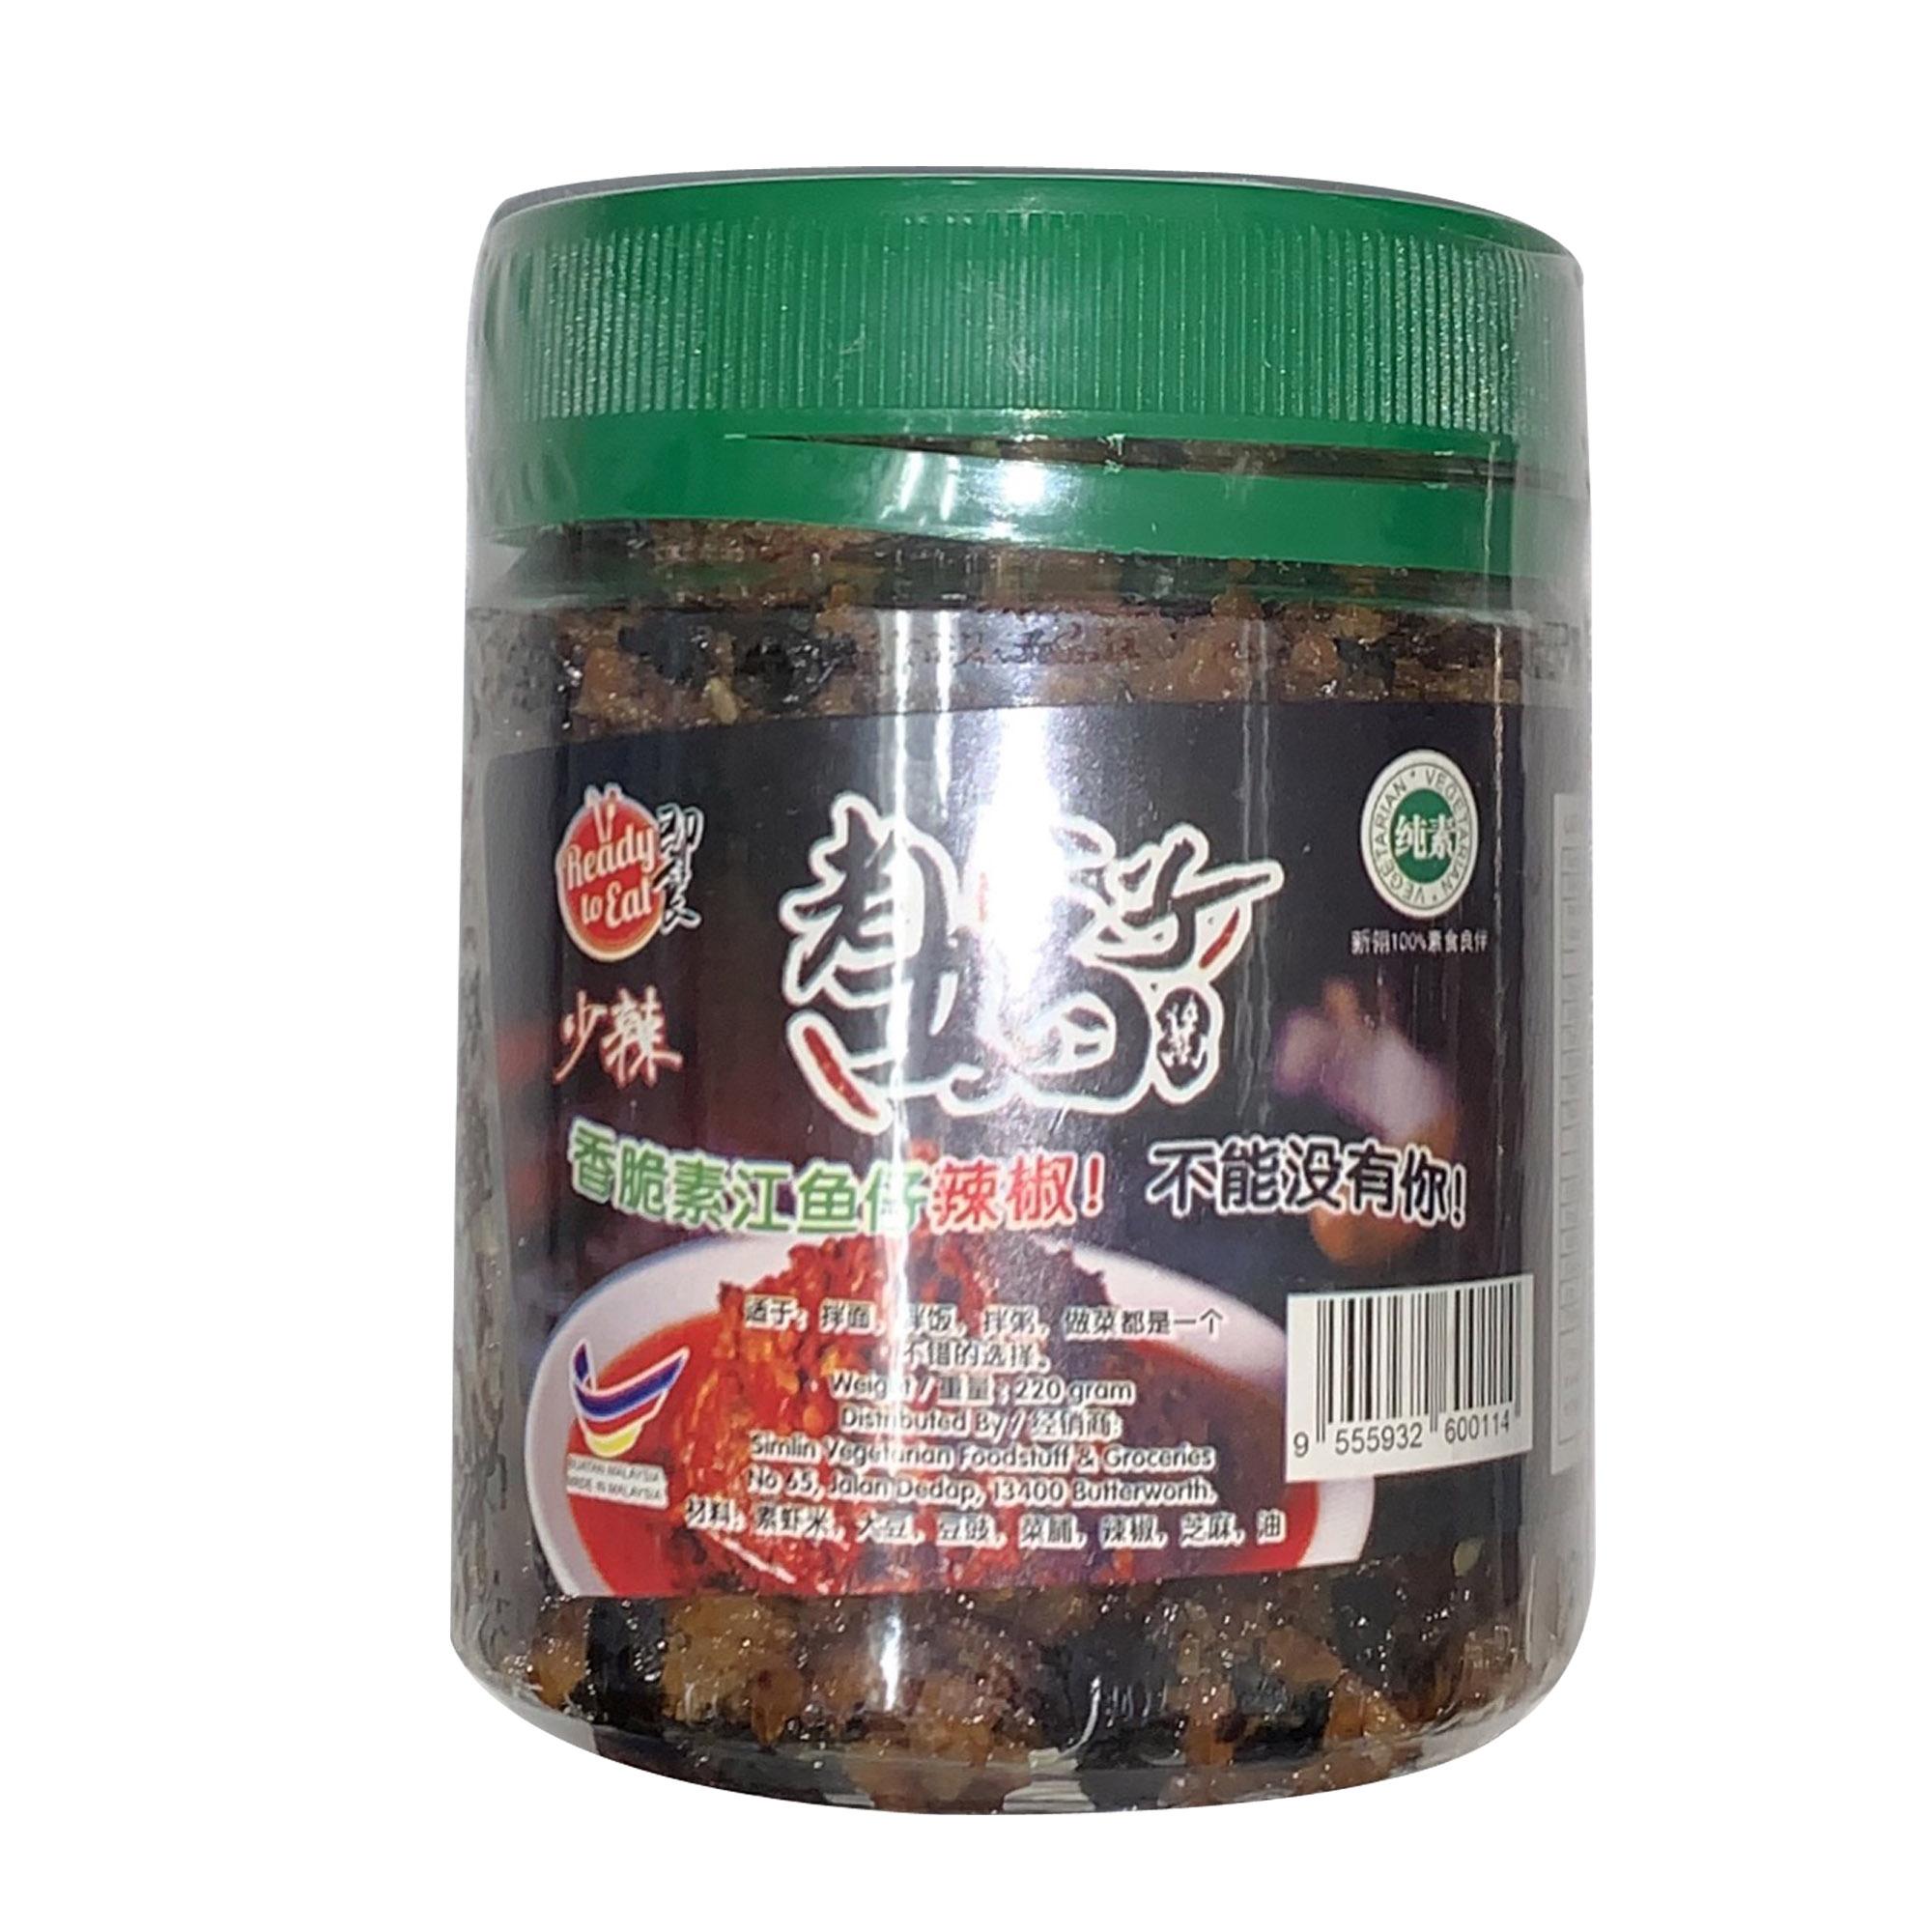 Image old mum crispy vegan chili 老妈子香脆素江鱼仔辣椒 220grams